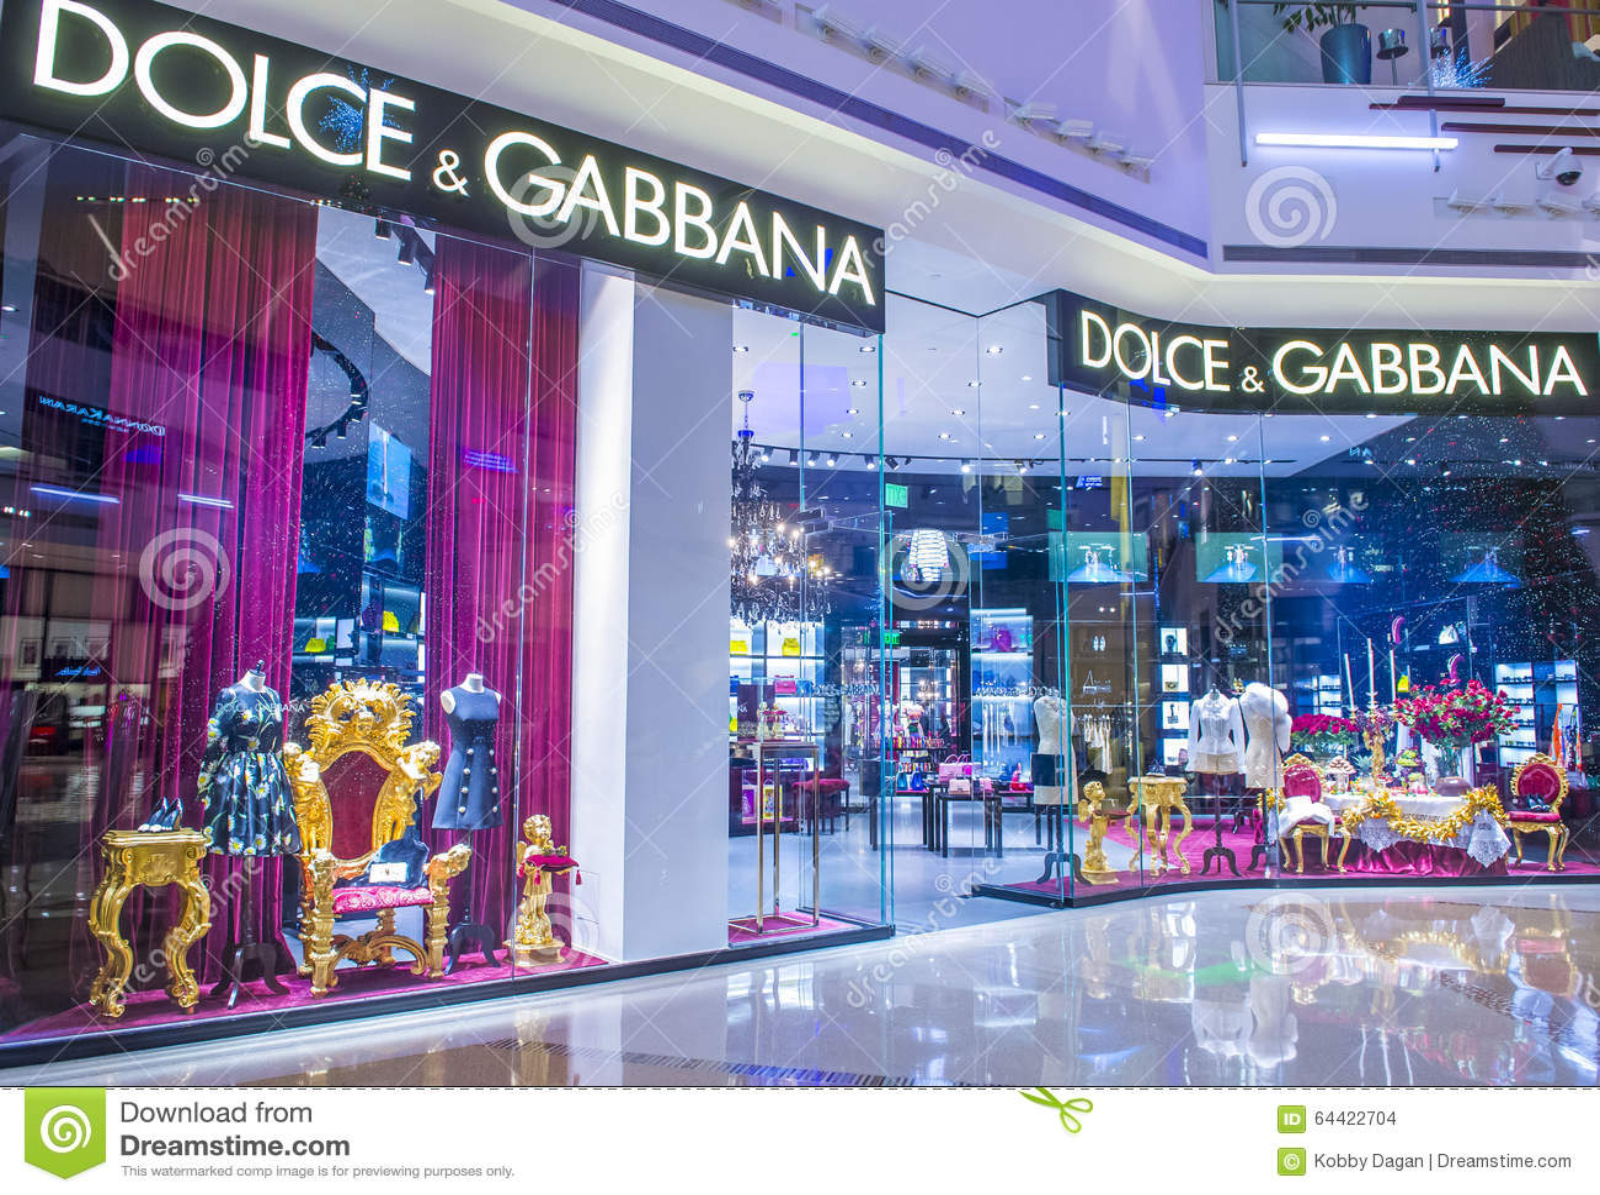 Clothing stores in las vegas strip